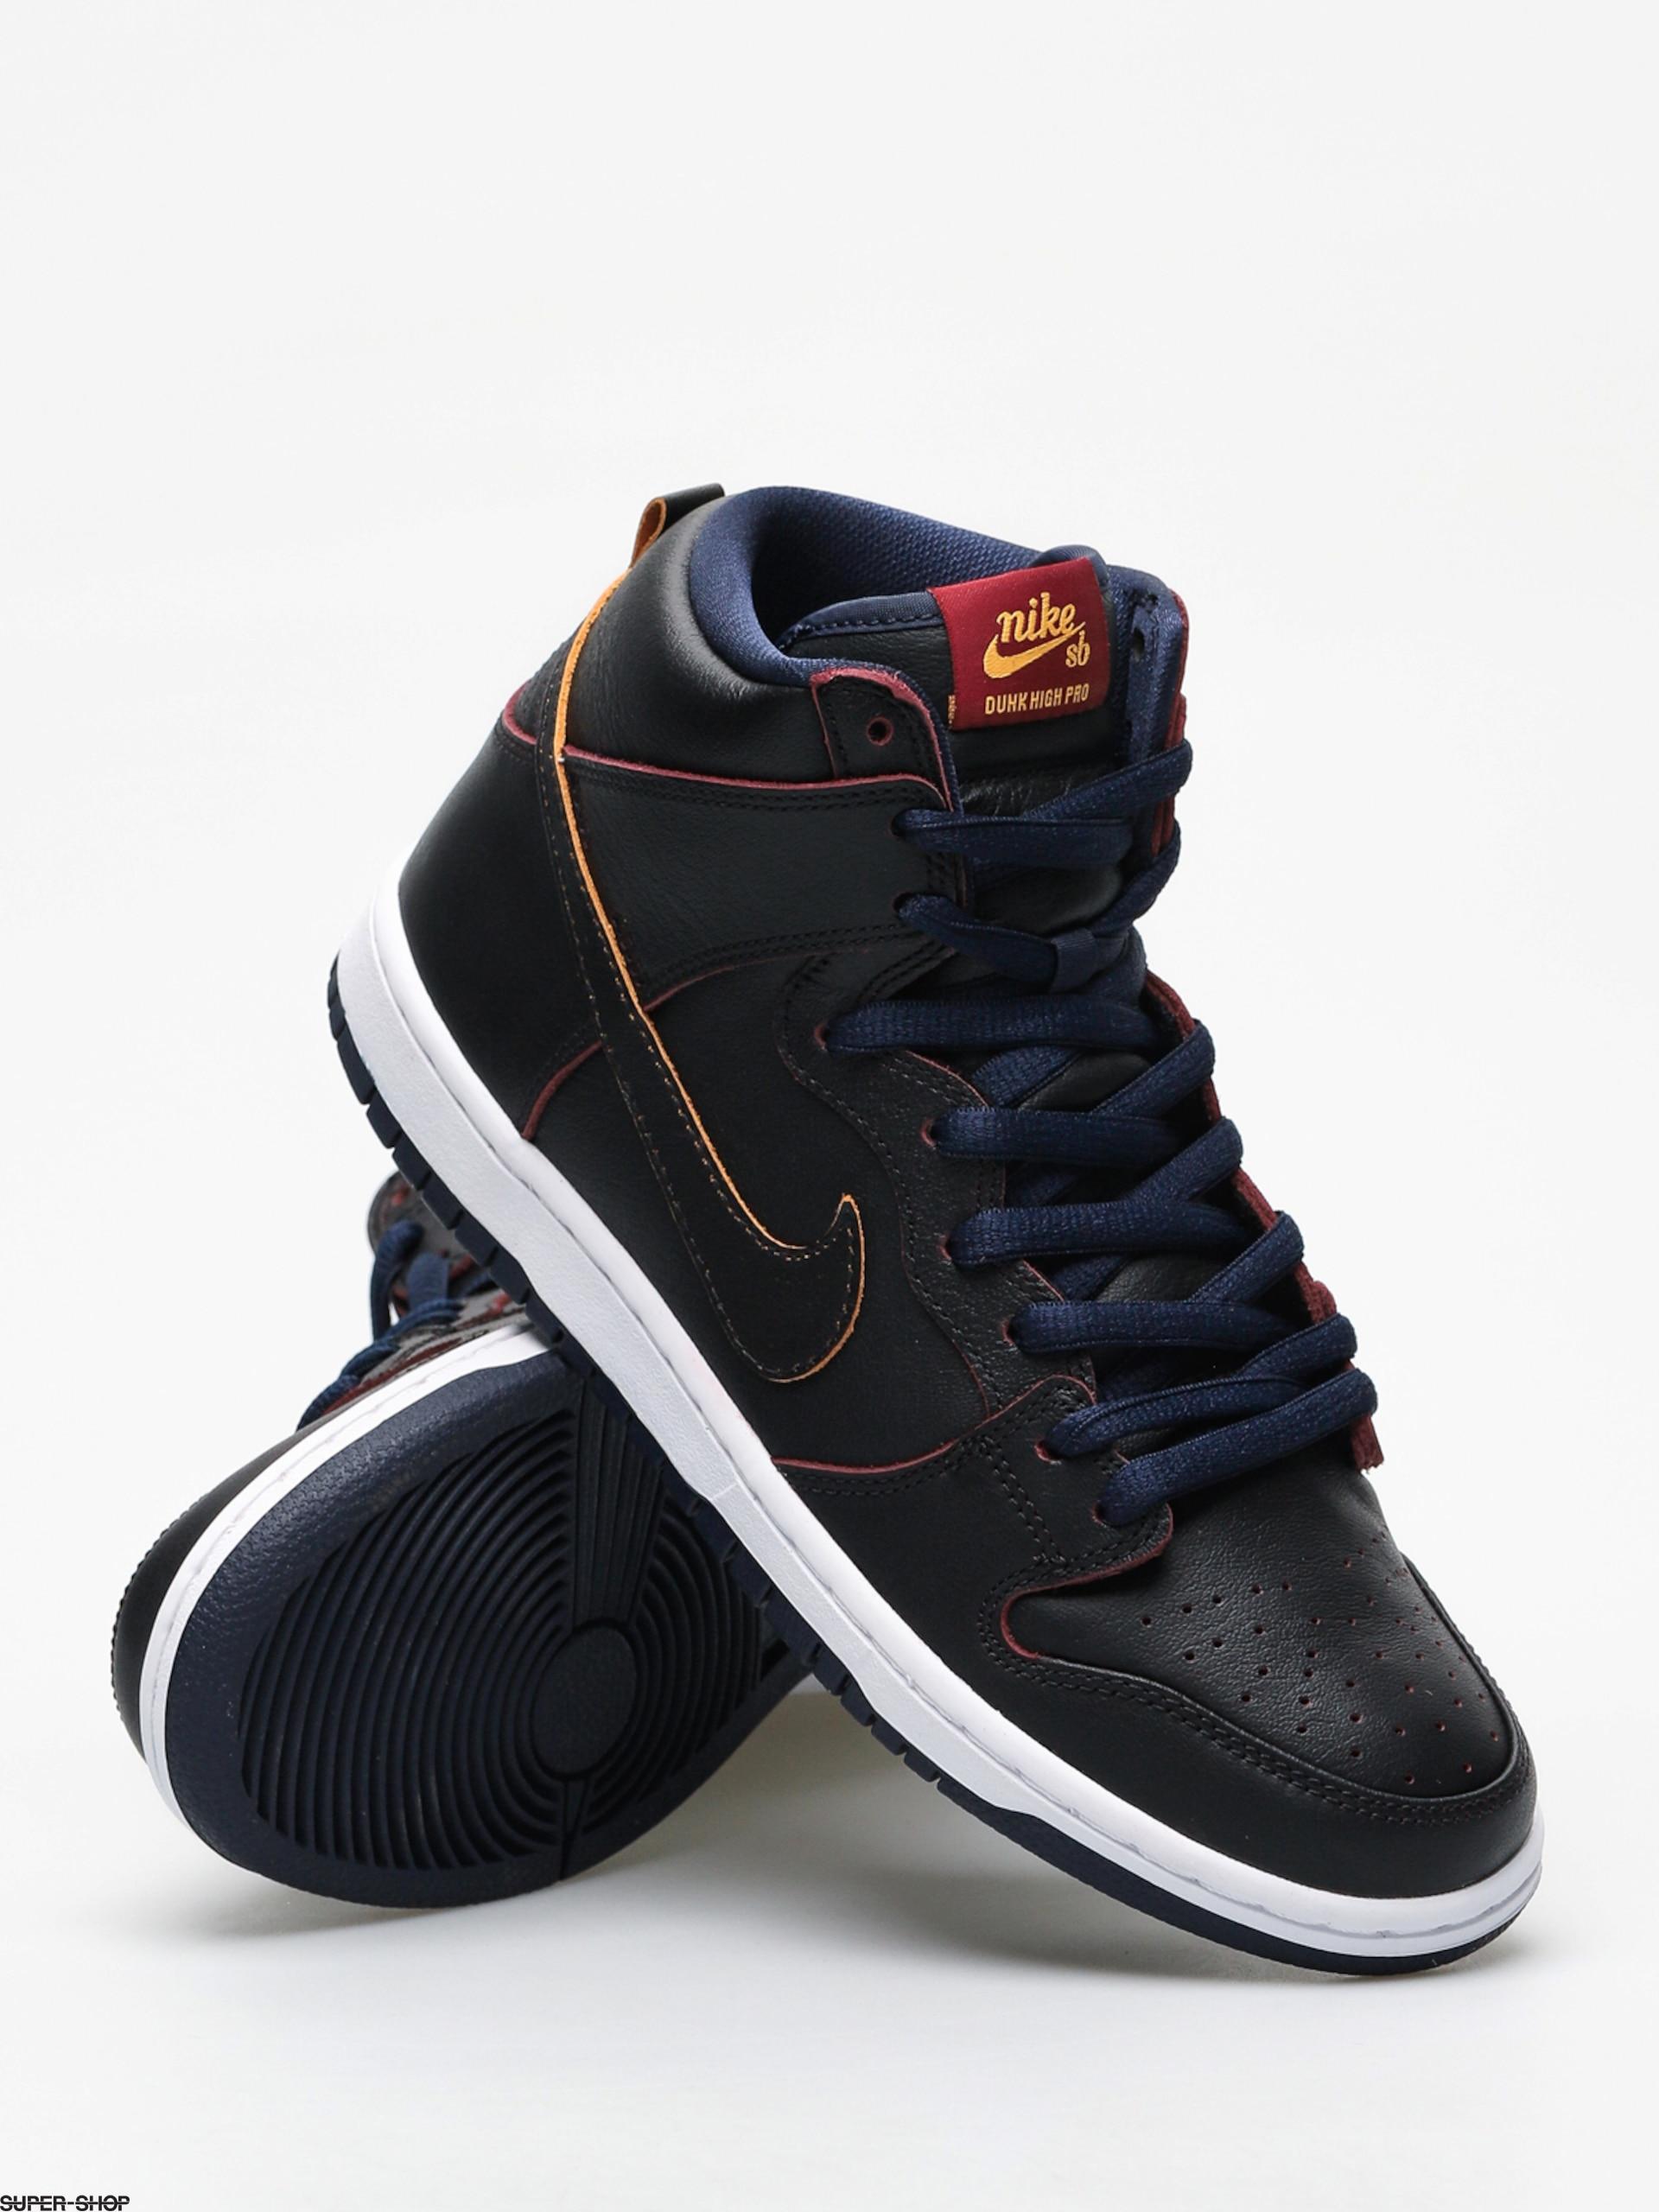 72bfee54f Nike SB Dunk High Pro Nba Shoes (black black college navy team red)